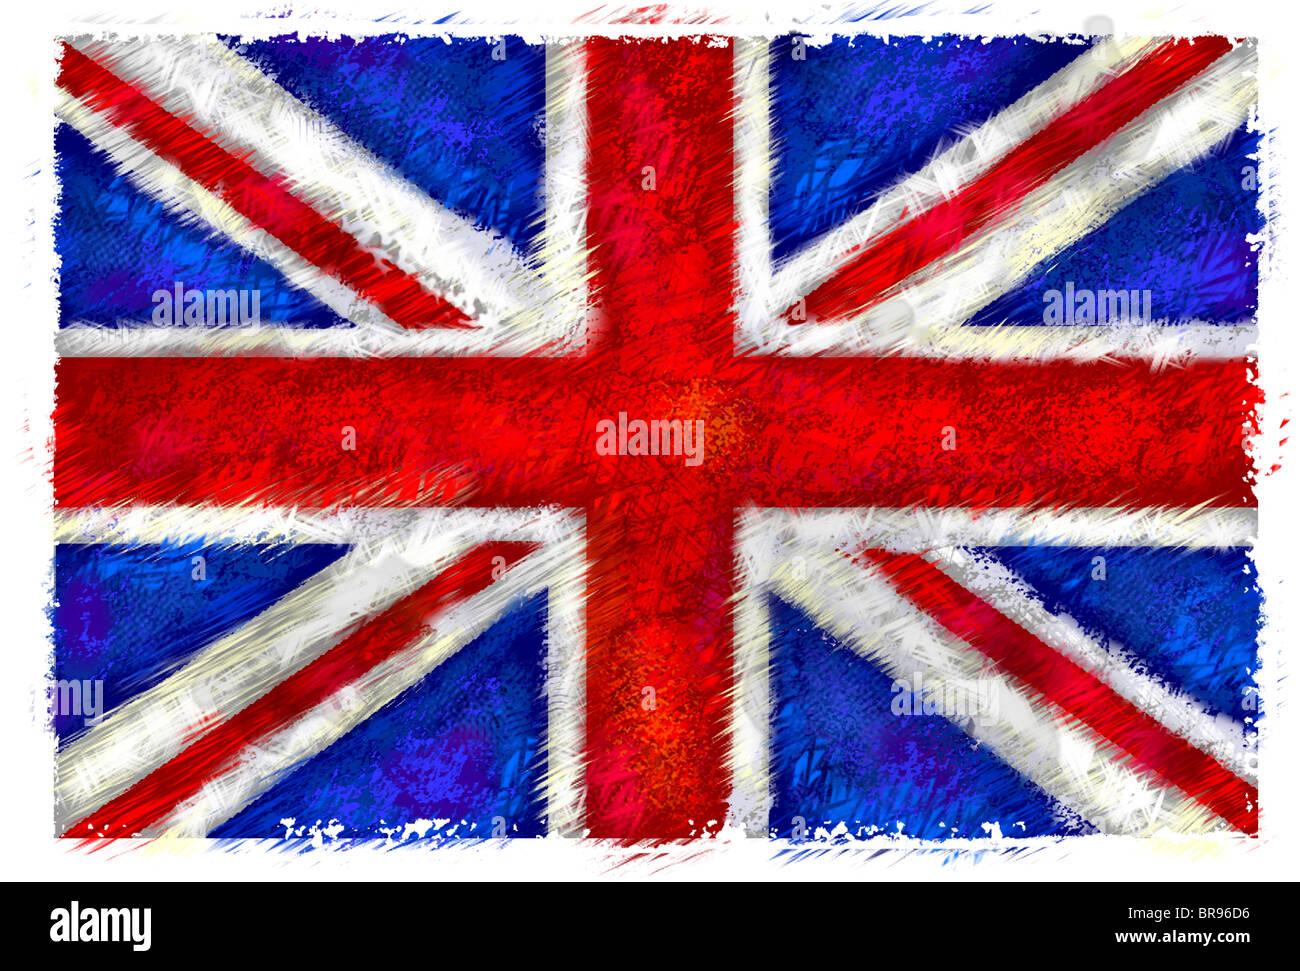 Dibujo De La Bandera Del Reino Unido Foto Imagen De Stock